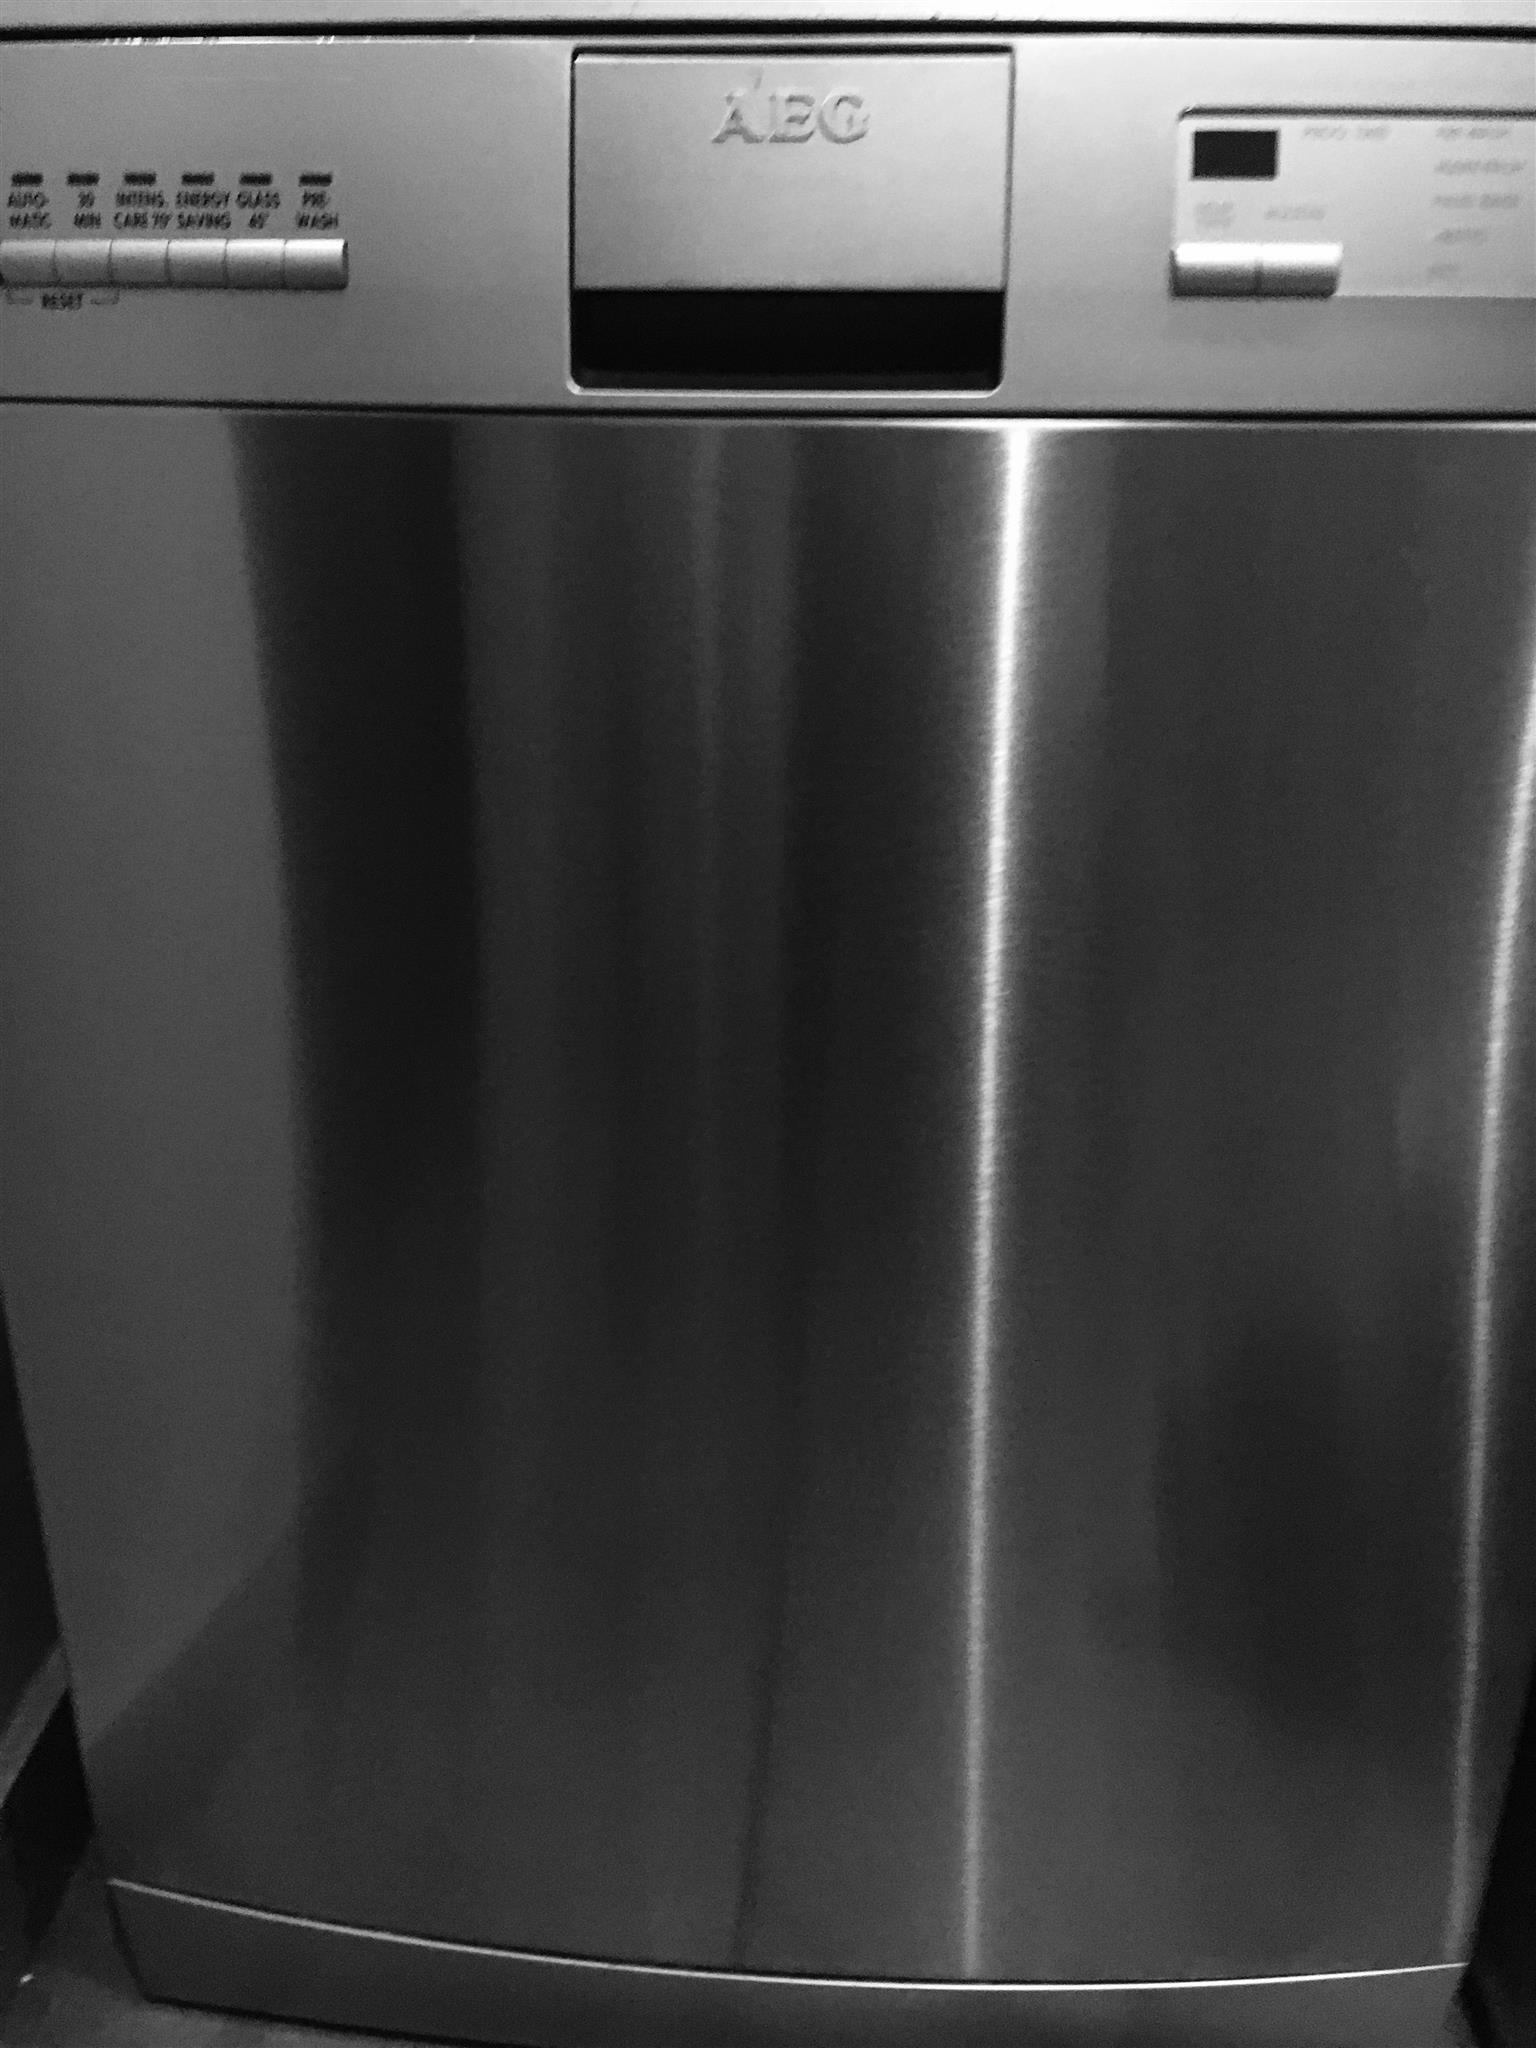 AEG dishwasher for spares